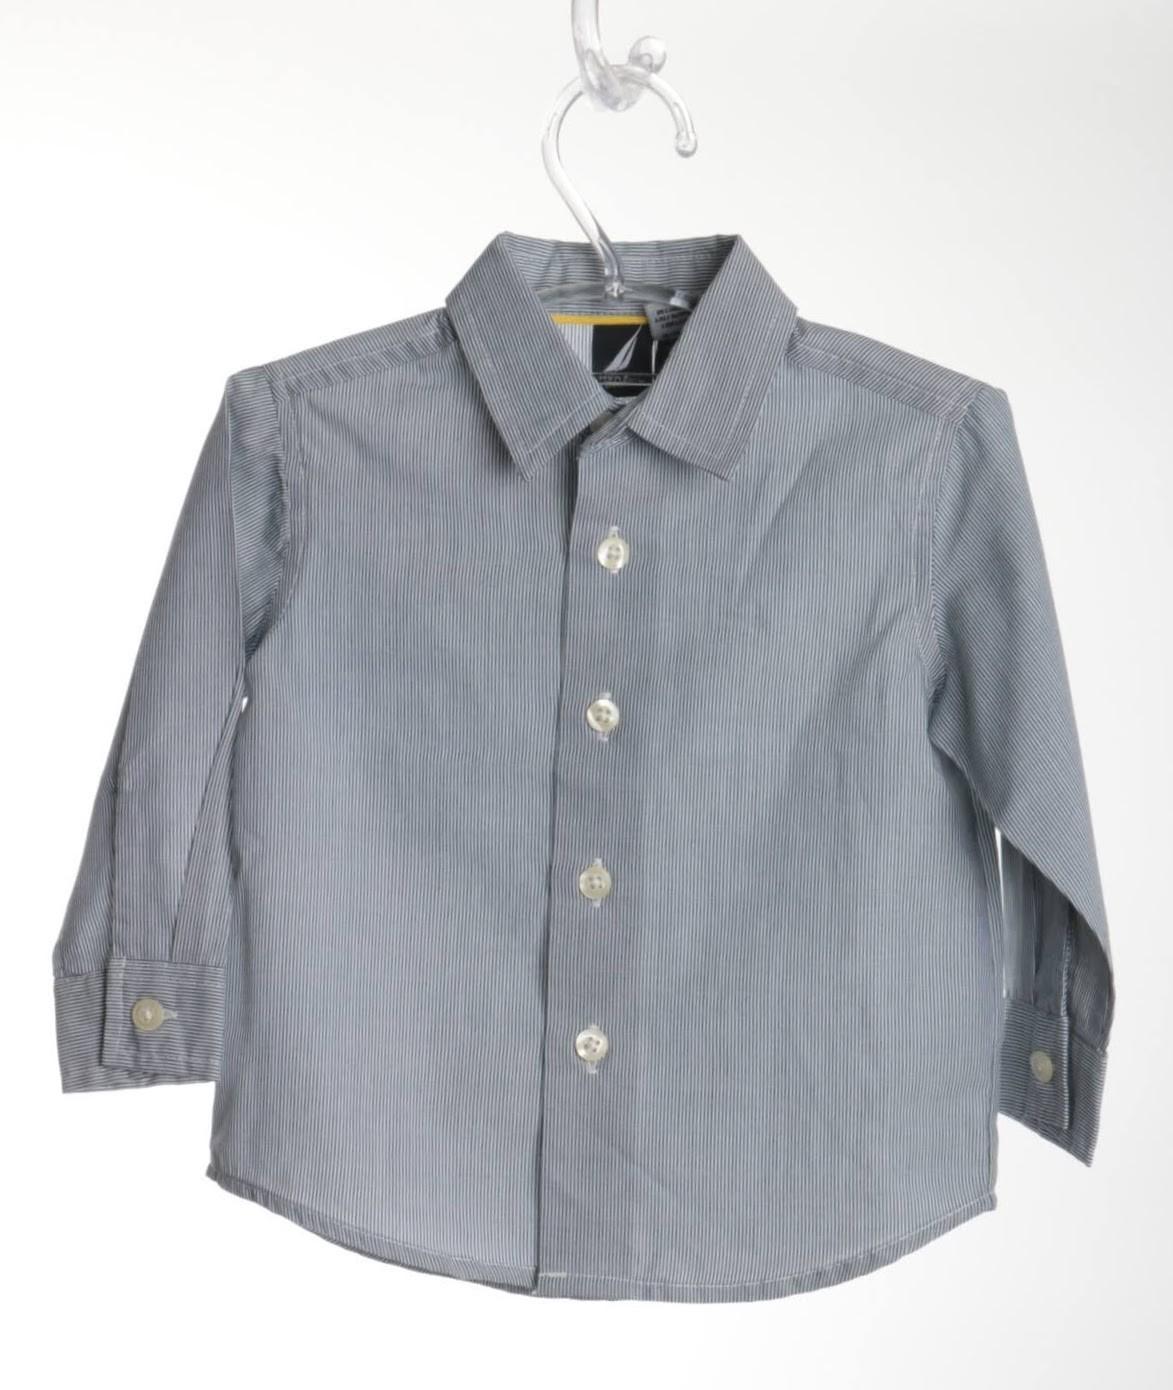 Camisa Listrada - Nautica - 06 Meses